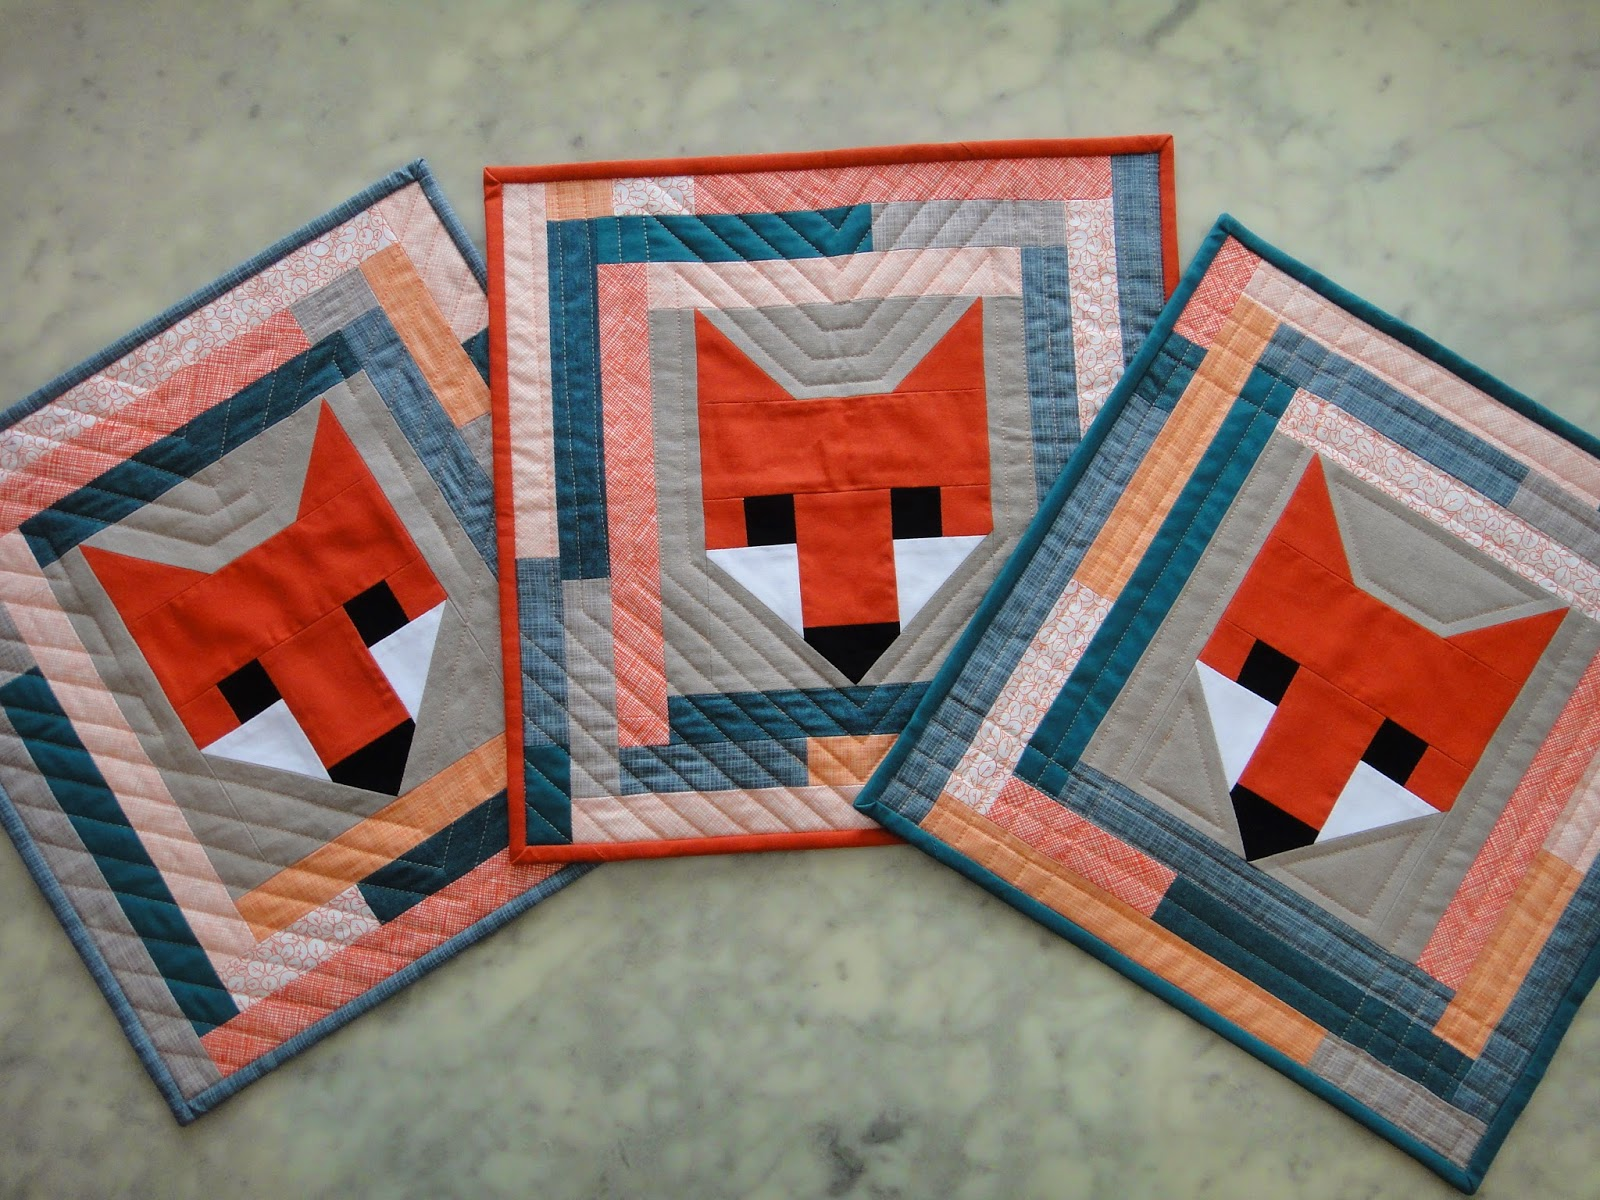 http://ablueskykindoflife.blogspot.com/2014/07/gettin-foxy.html